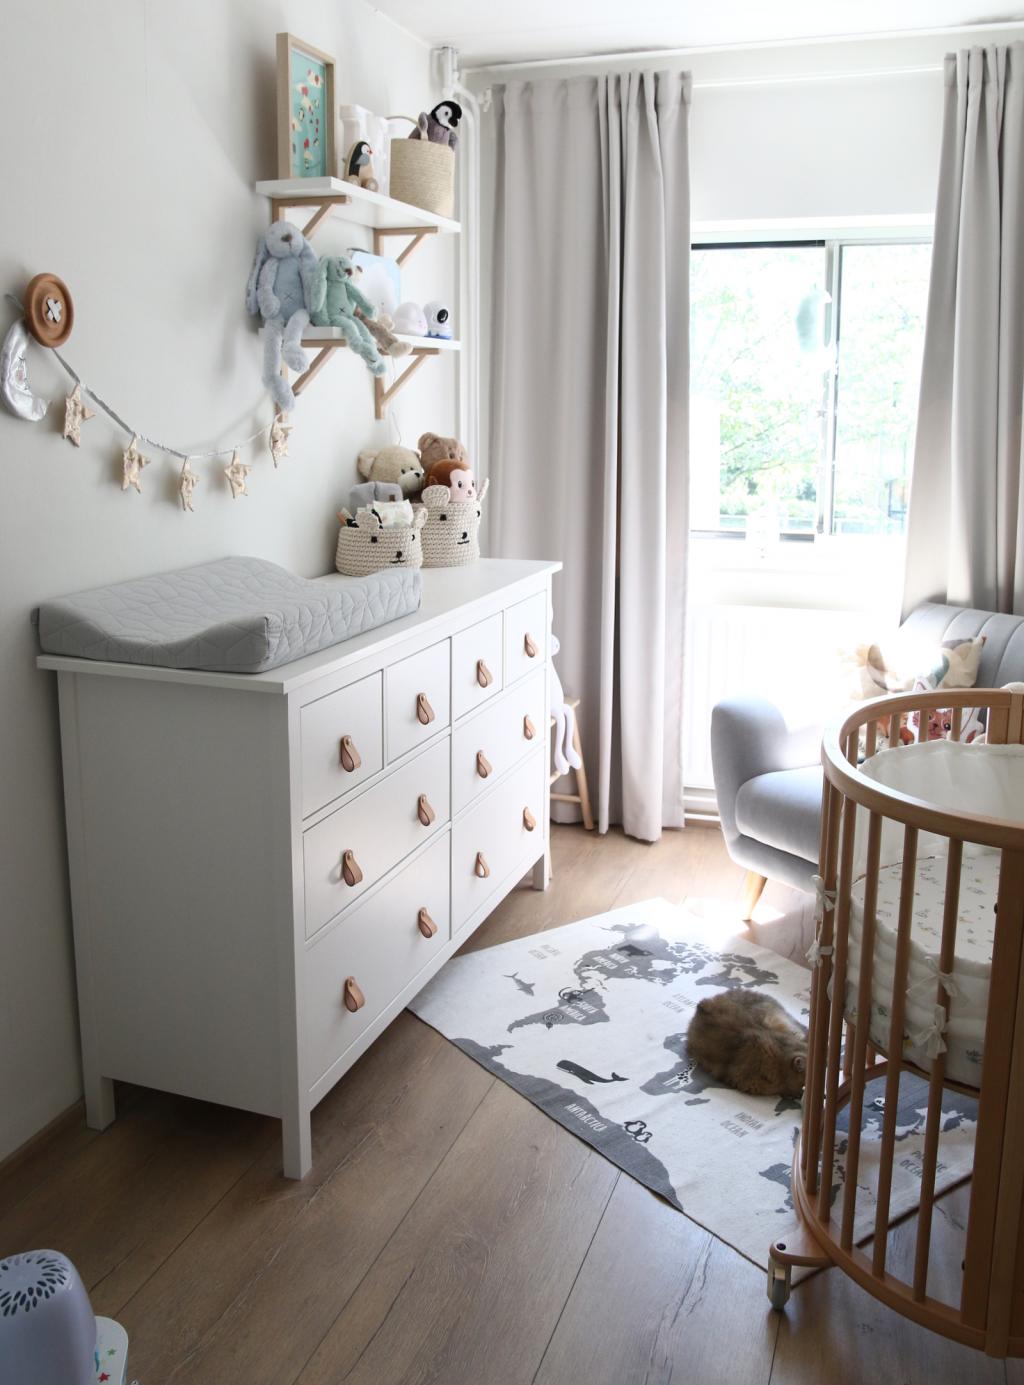 De babykamer | rondleiding, tips & inspiratie ⋆ Beautylab.nl